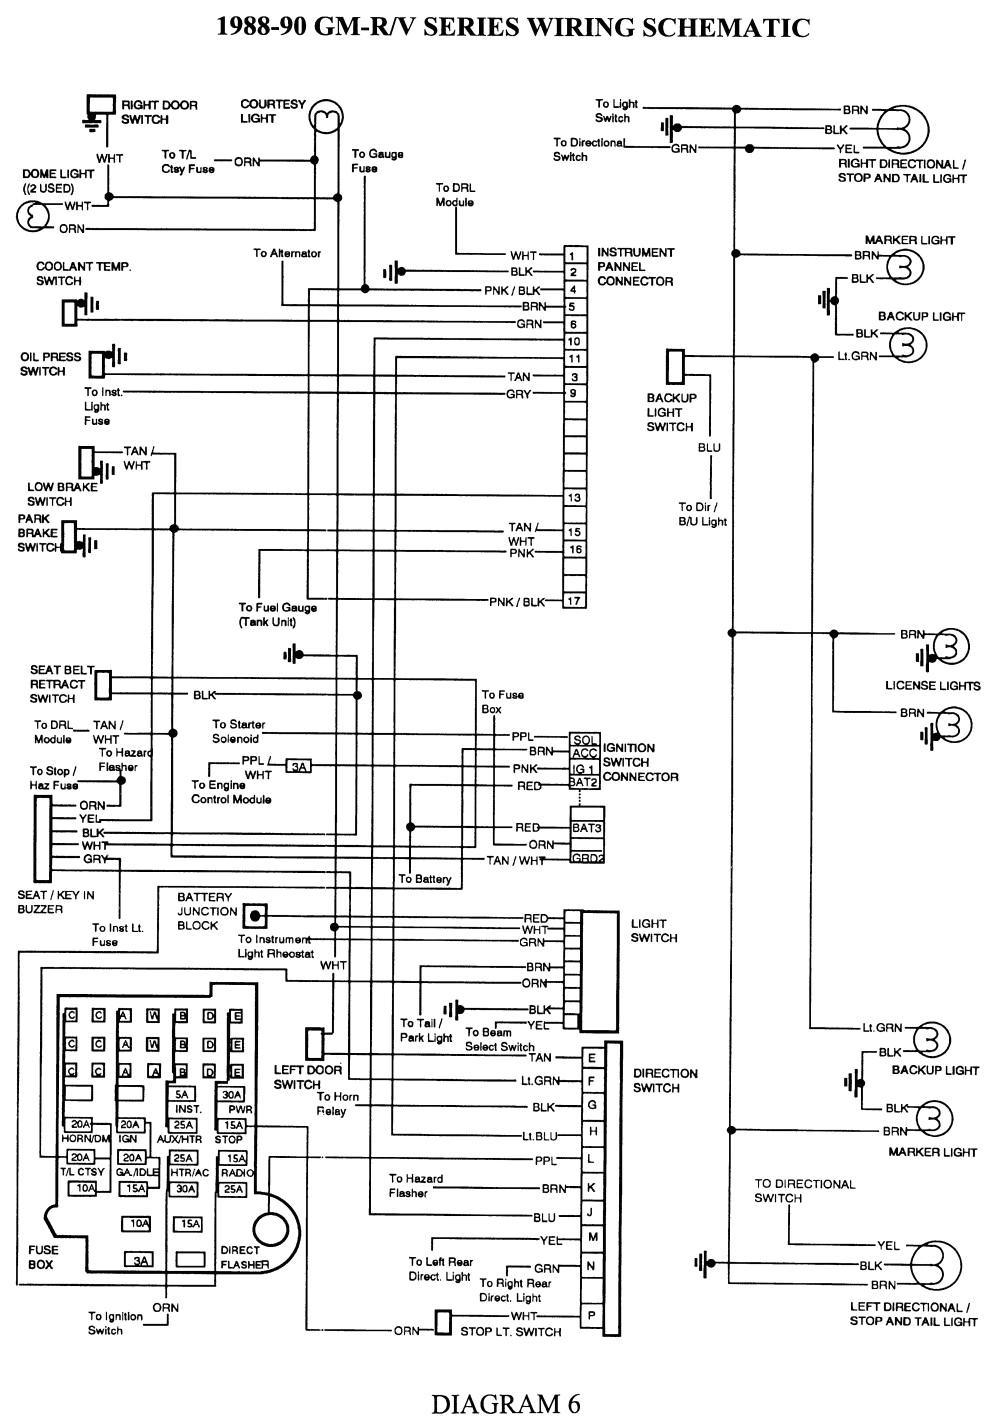 1989 chevy silverado tail light wiring wiring diagram perfomance 1989 silverado wiring diagram wiring diagram 1989